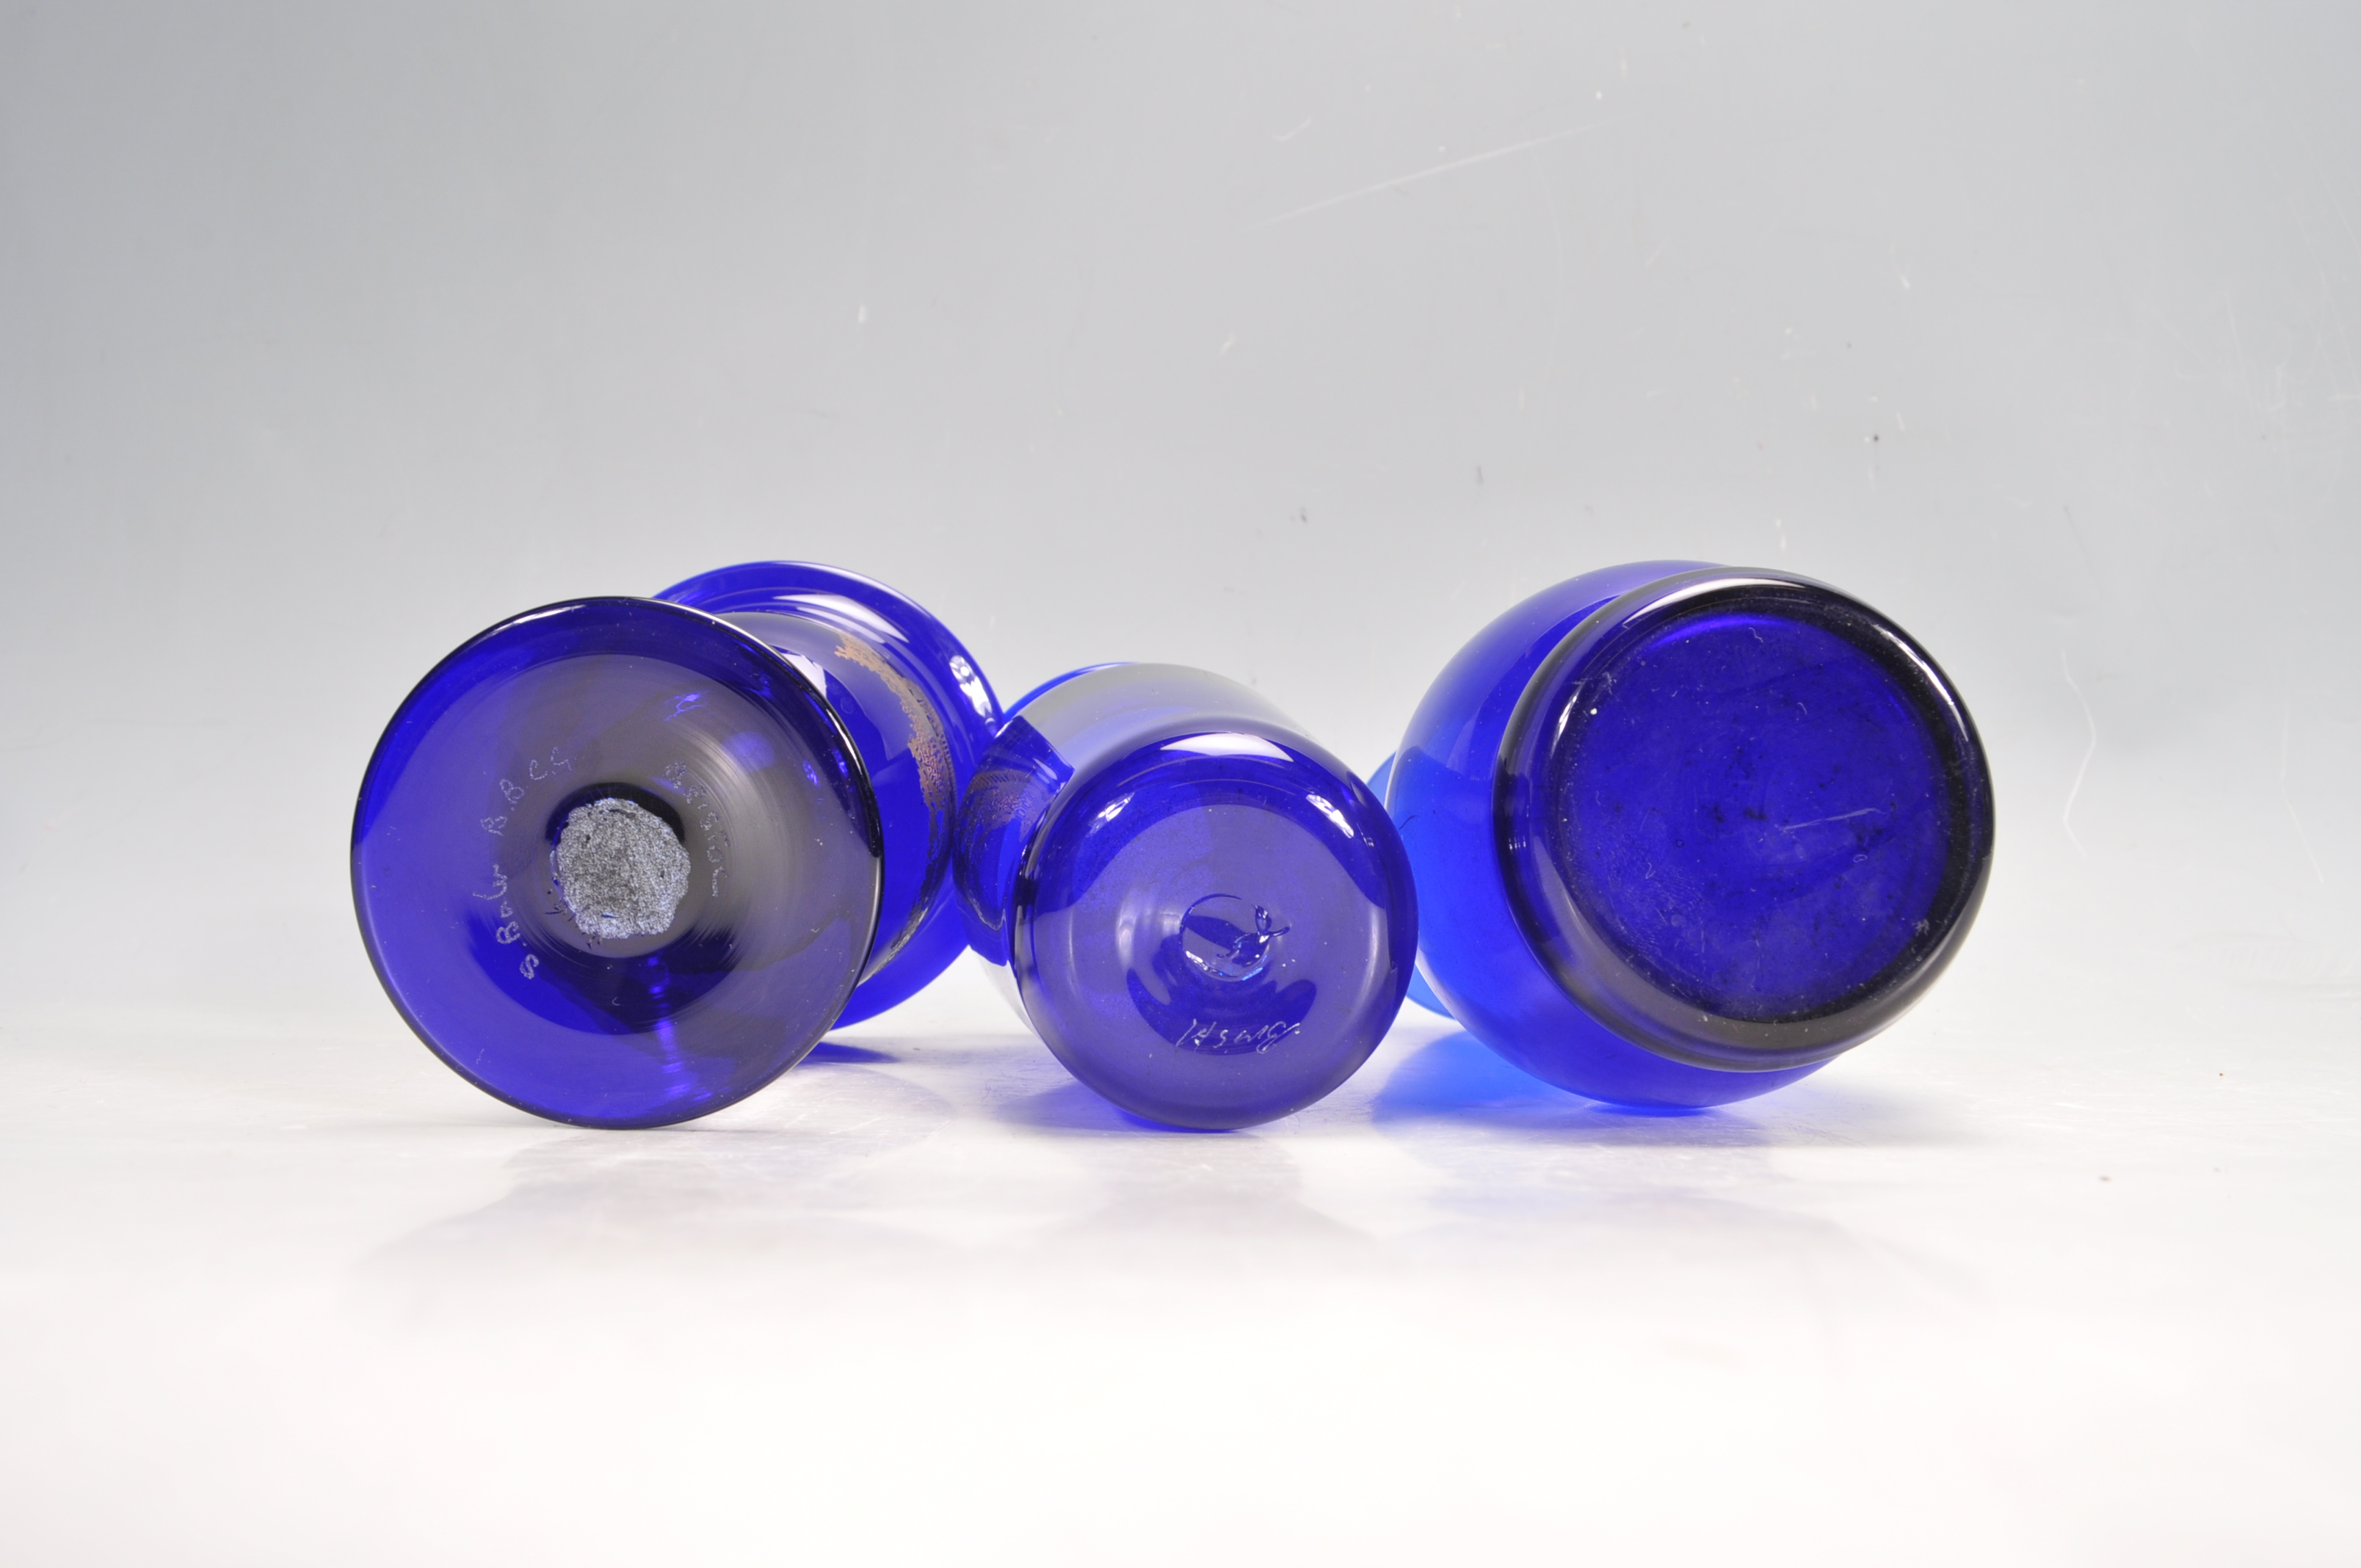 BRISTOL BLUE GLASS ORNAMENTS - Image 18 of 34